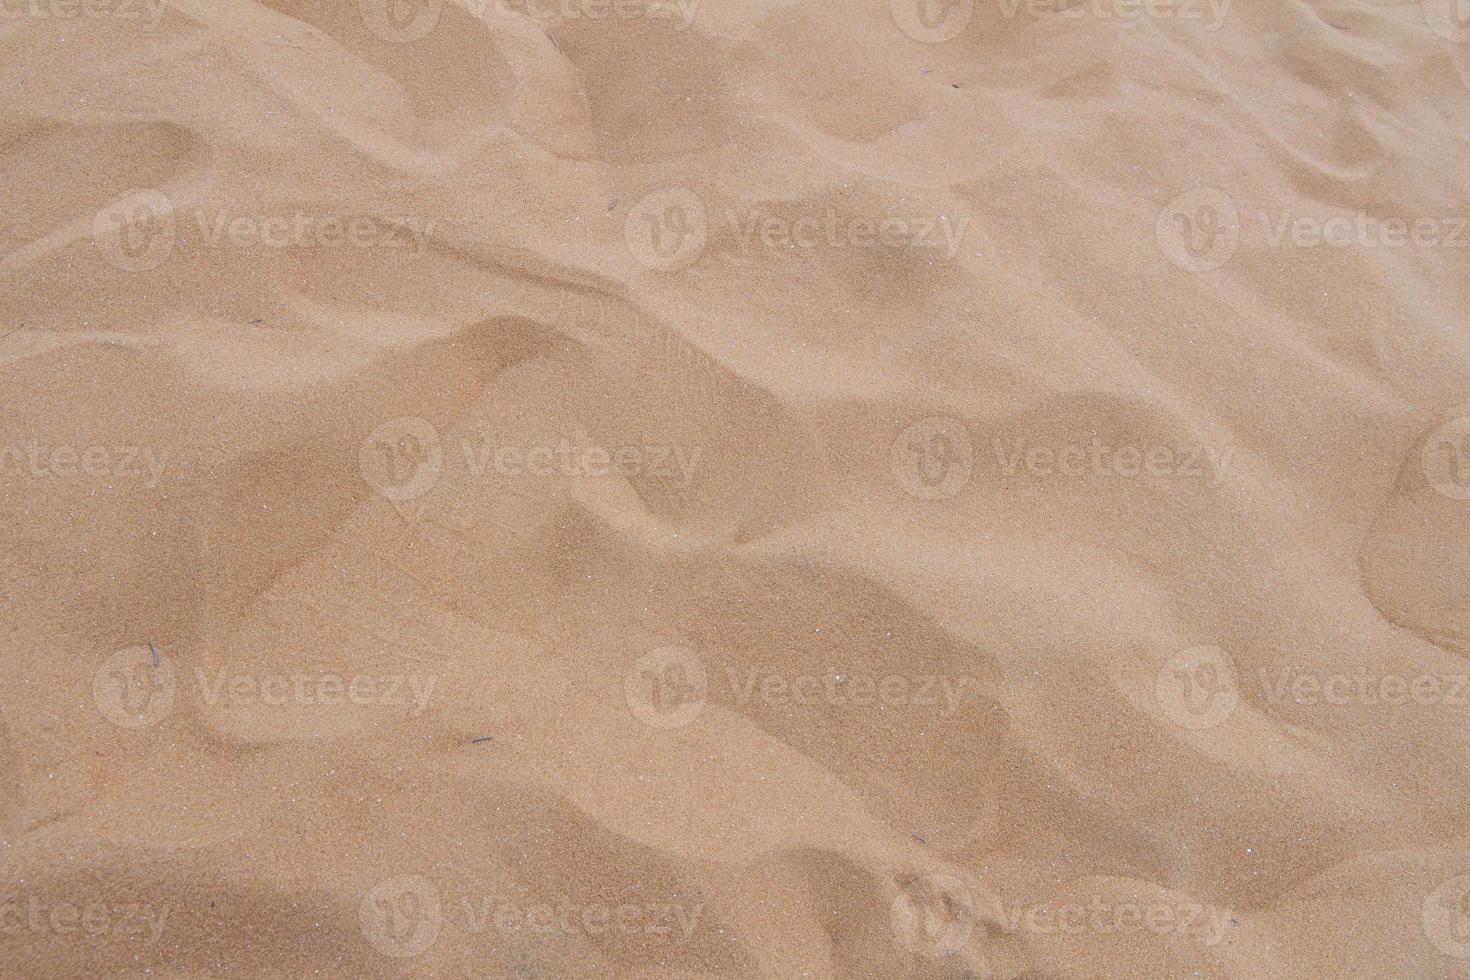 red sand texture form red sand dune Vietnam photo